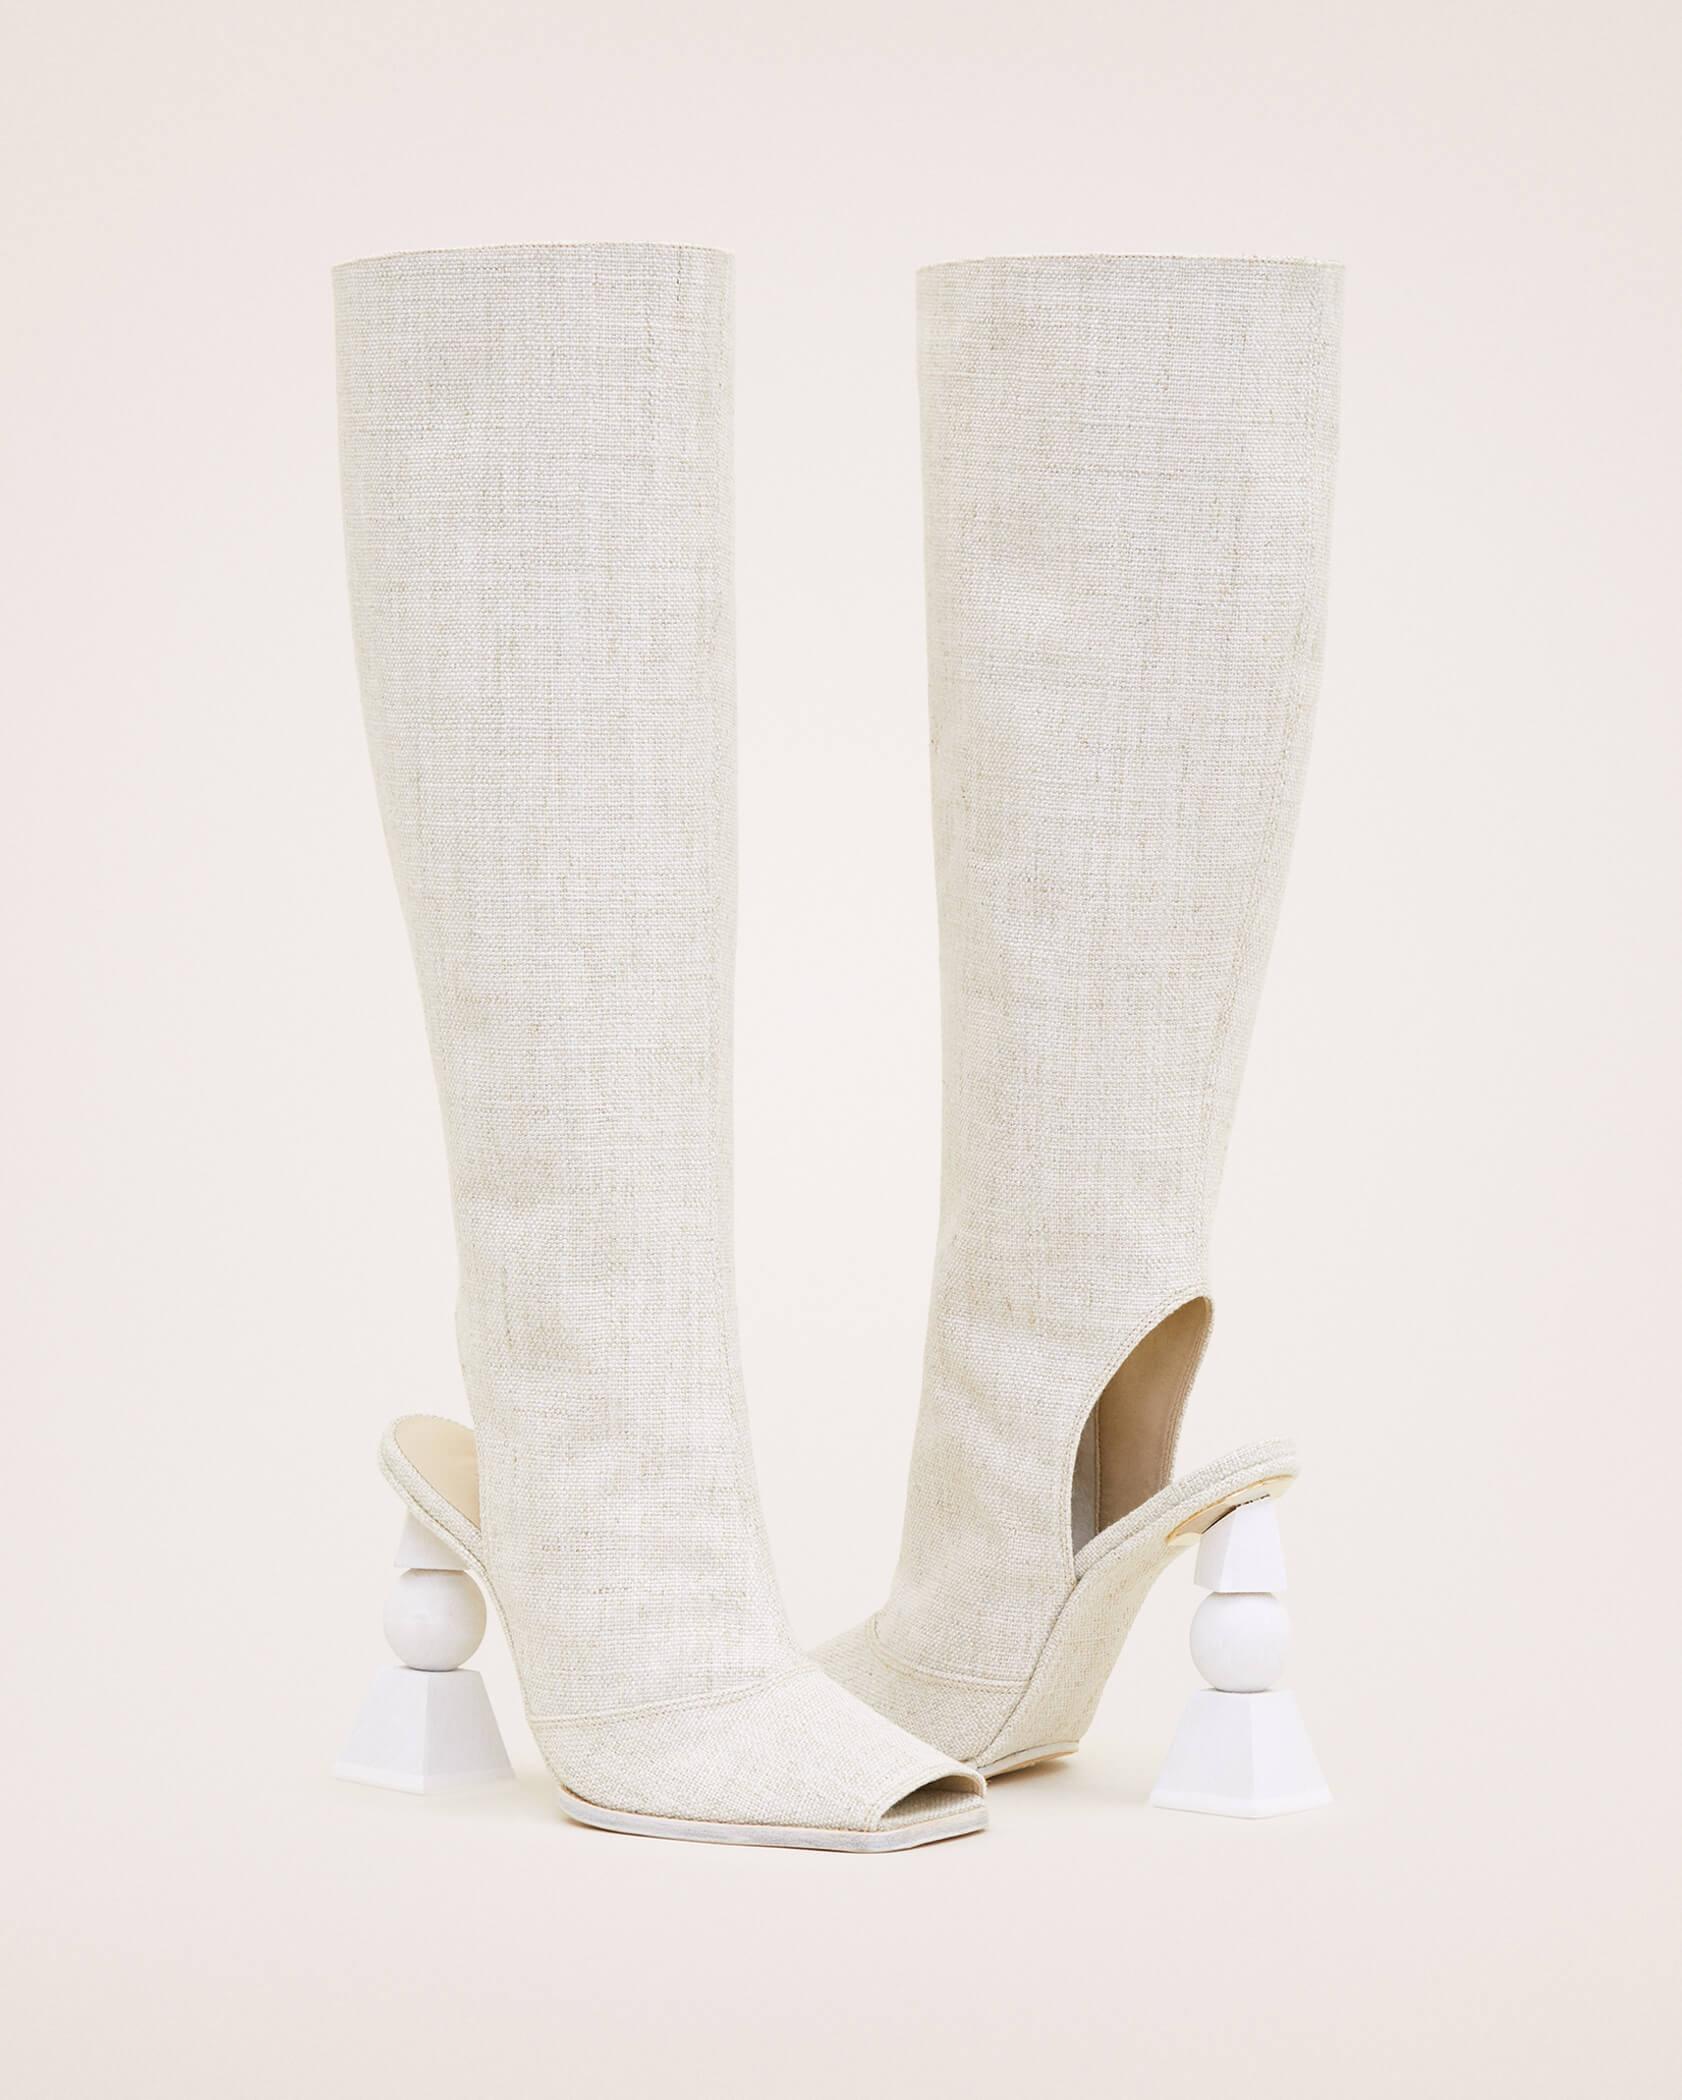 Les bottes Olive